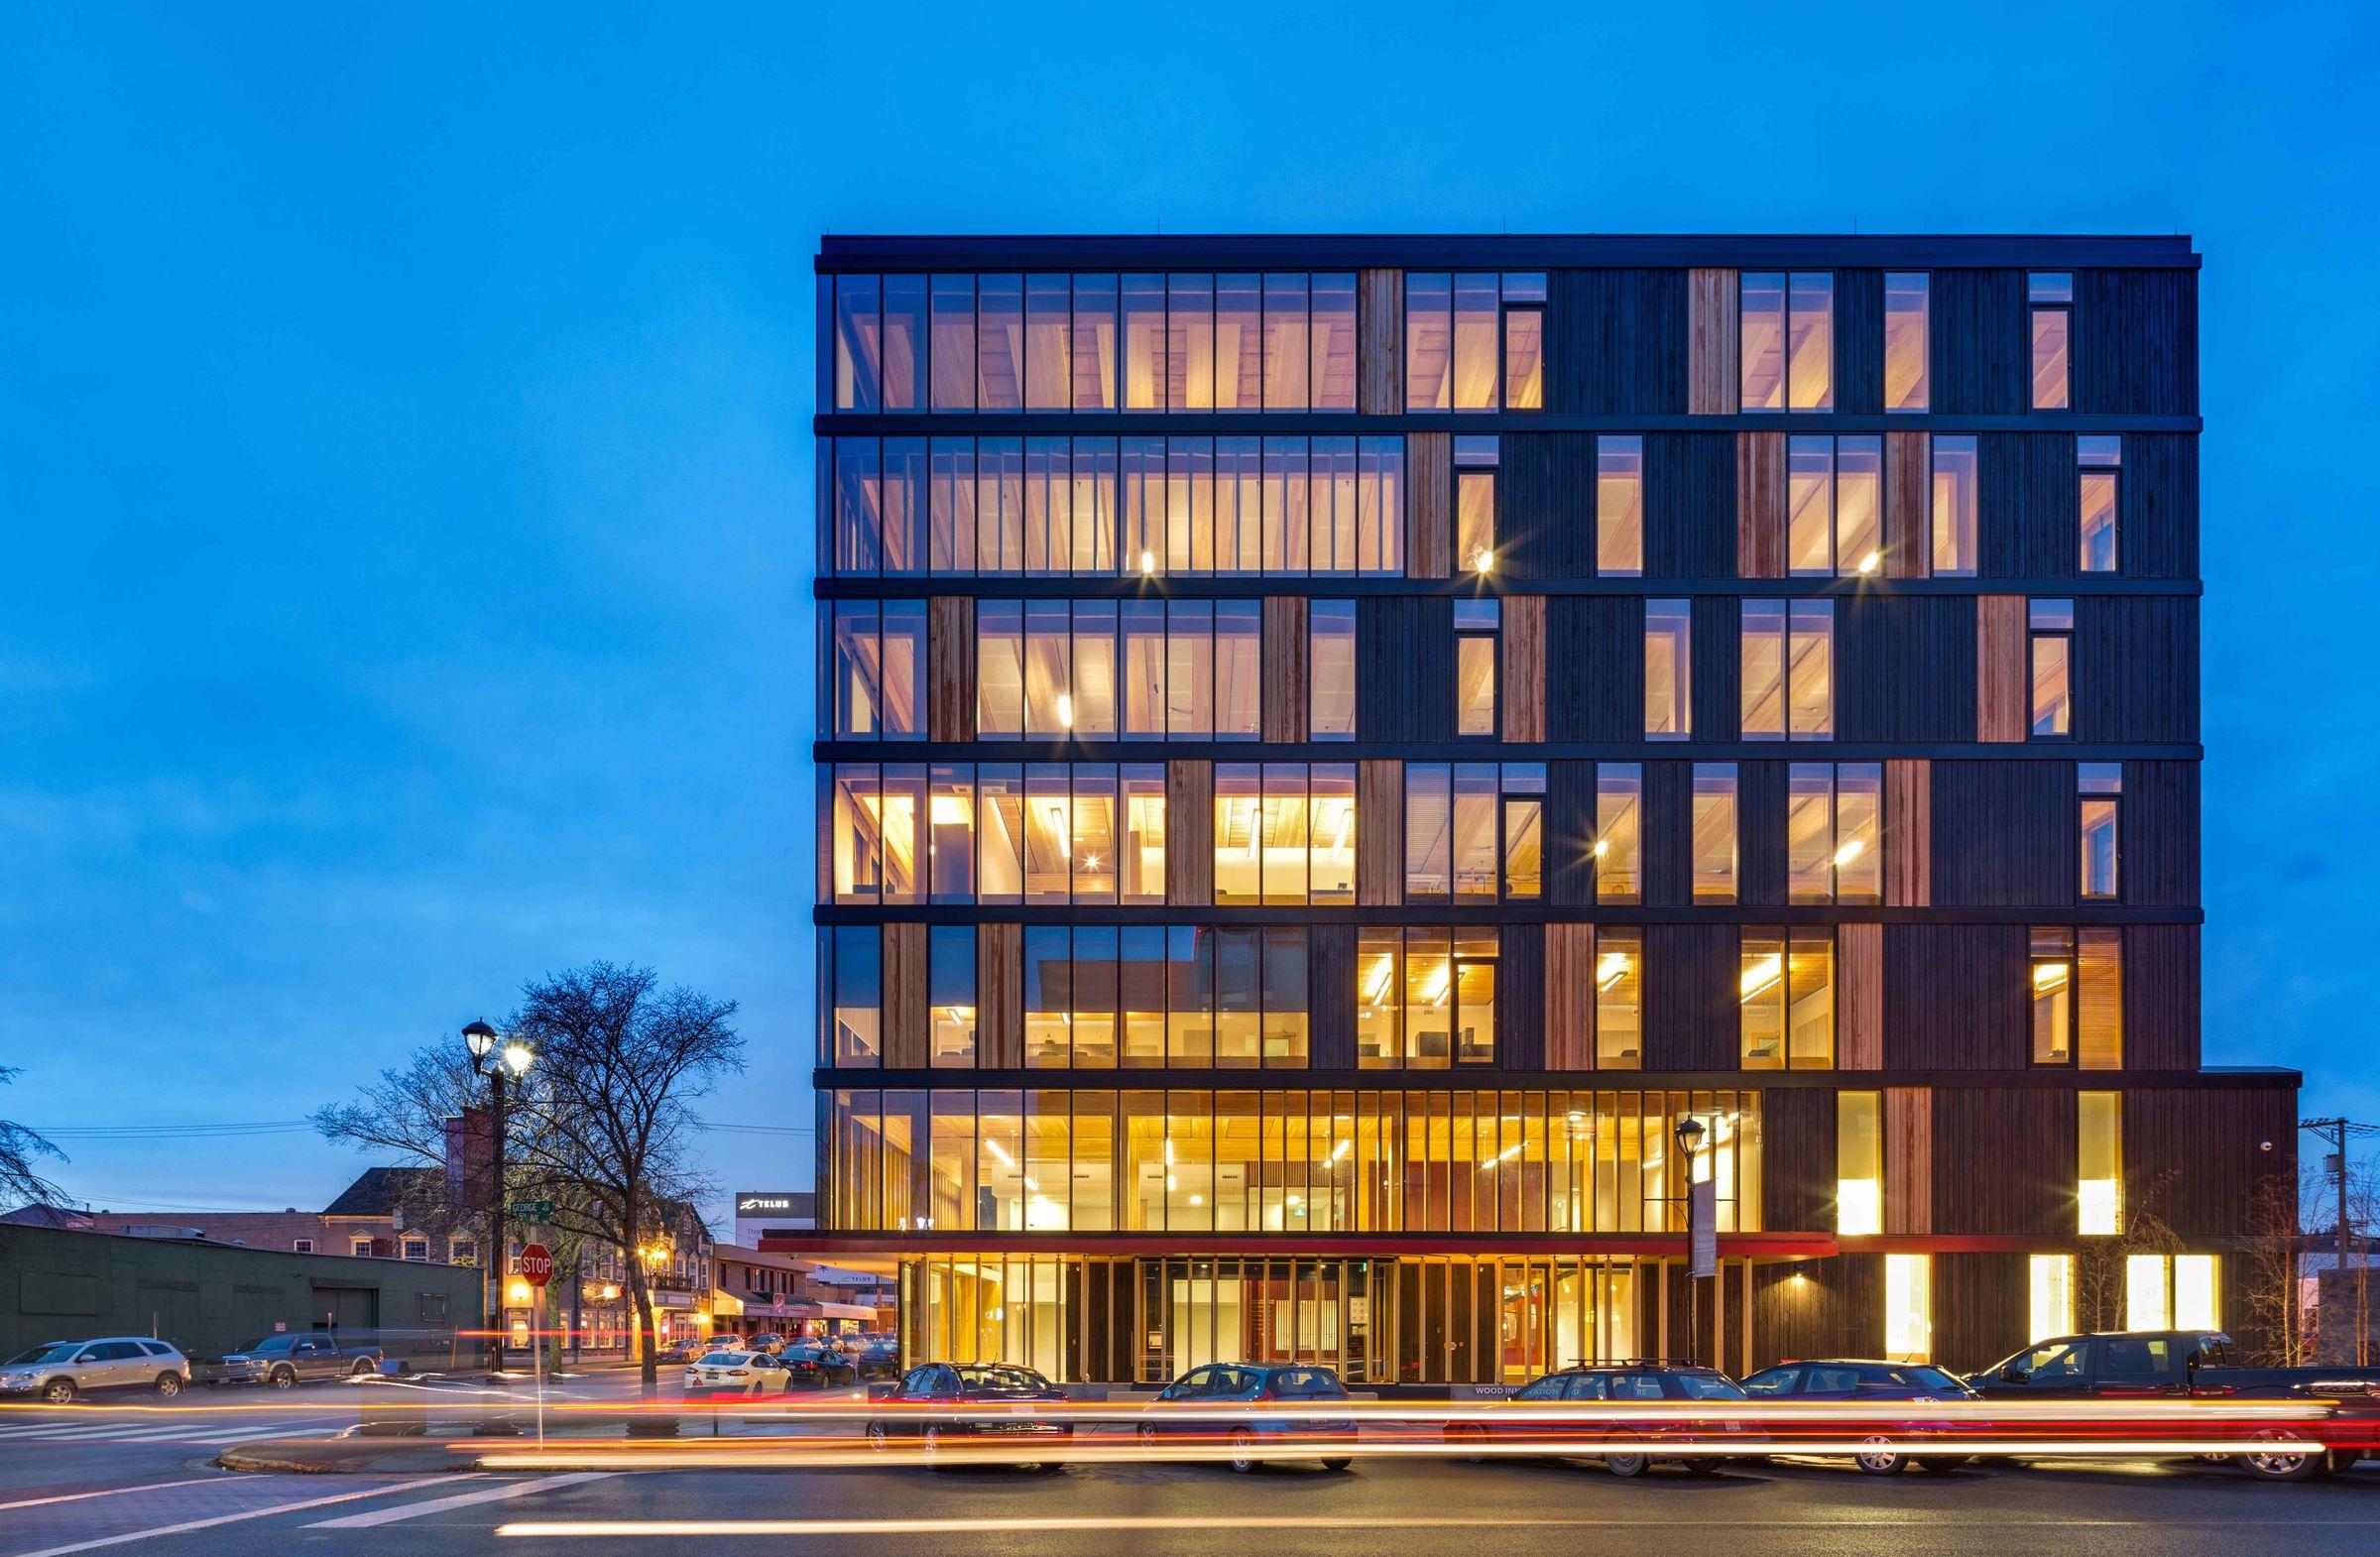 architecture aw raics innovation - HD2000×1308